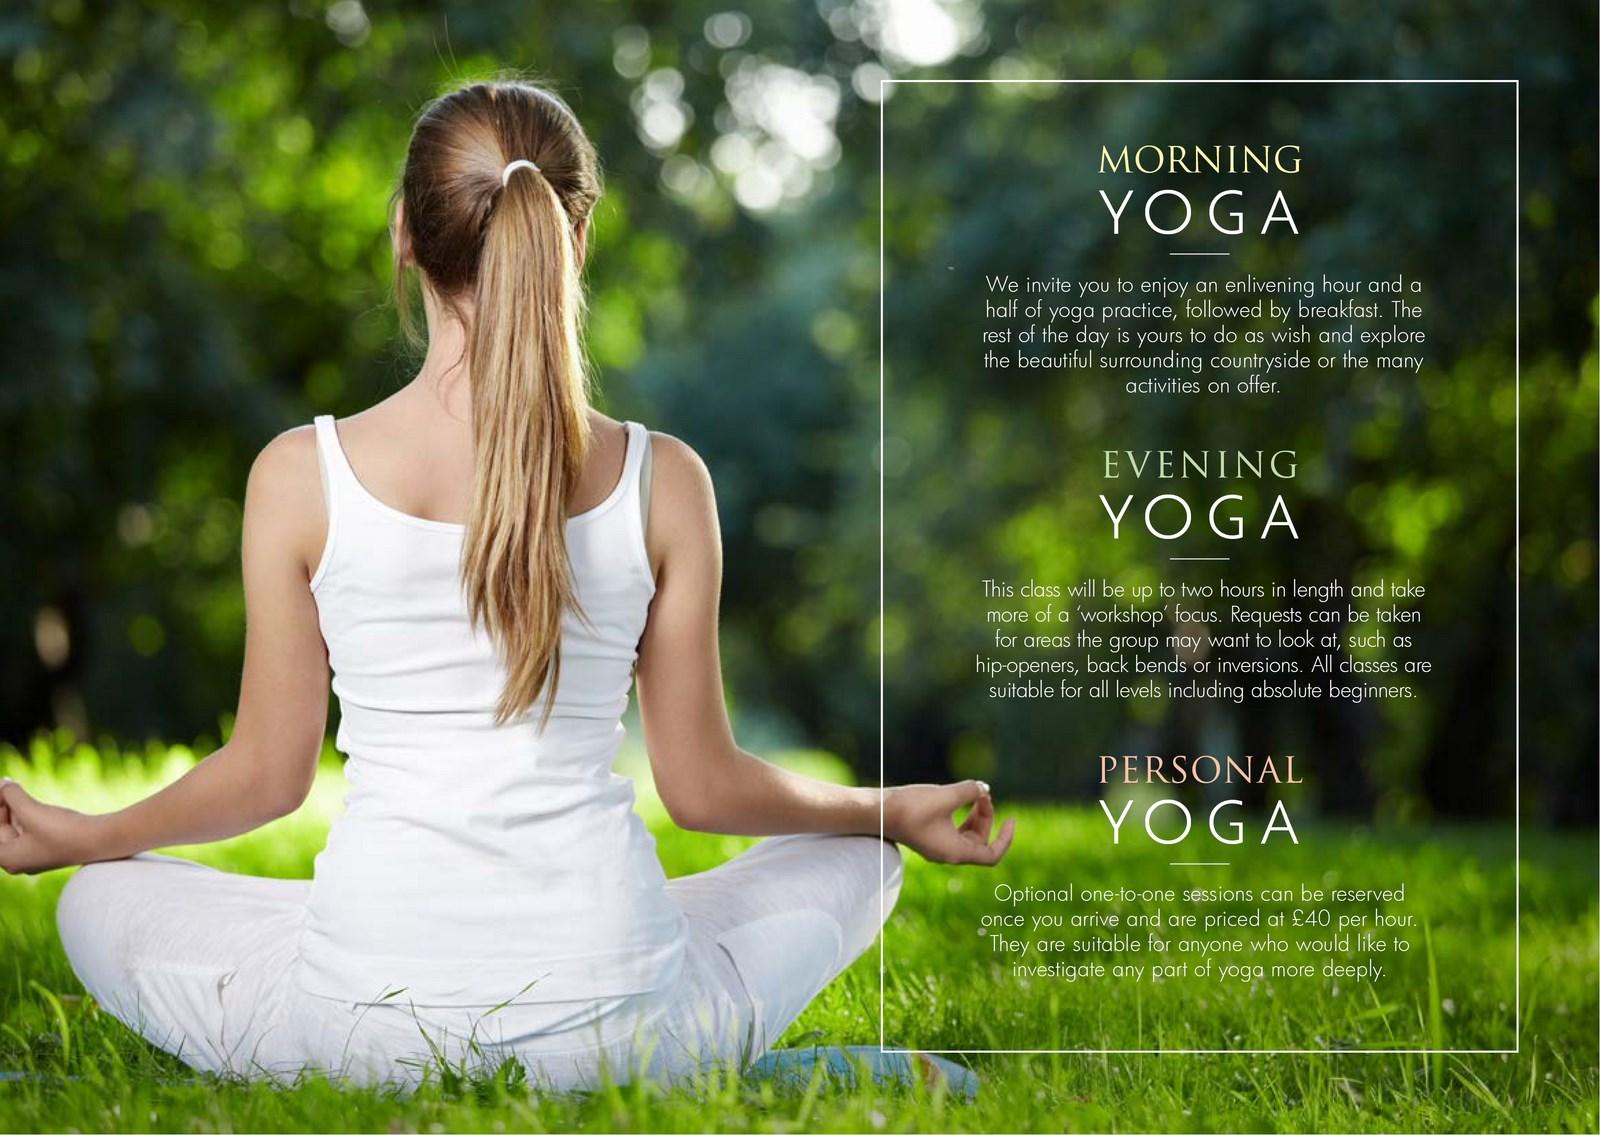 Yoga BreakTexte